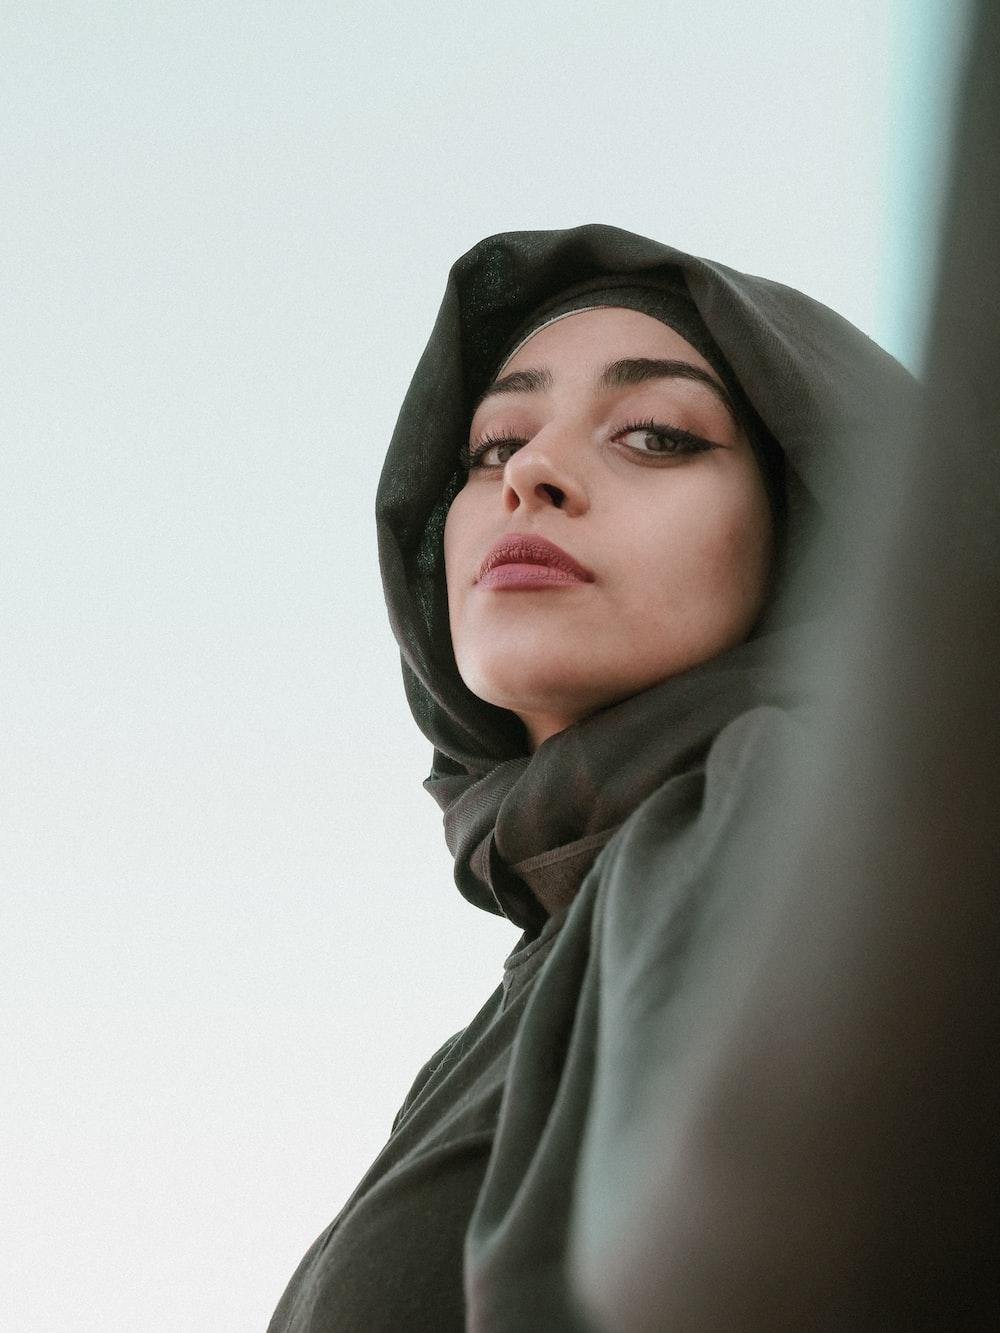 woman in gray hijab taking selfie